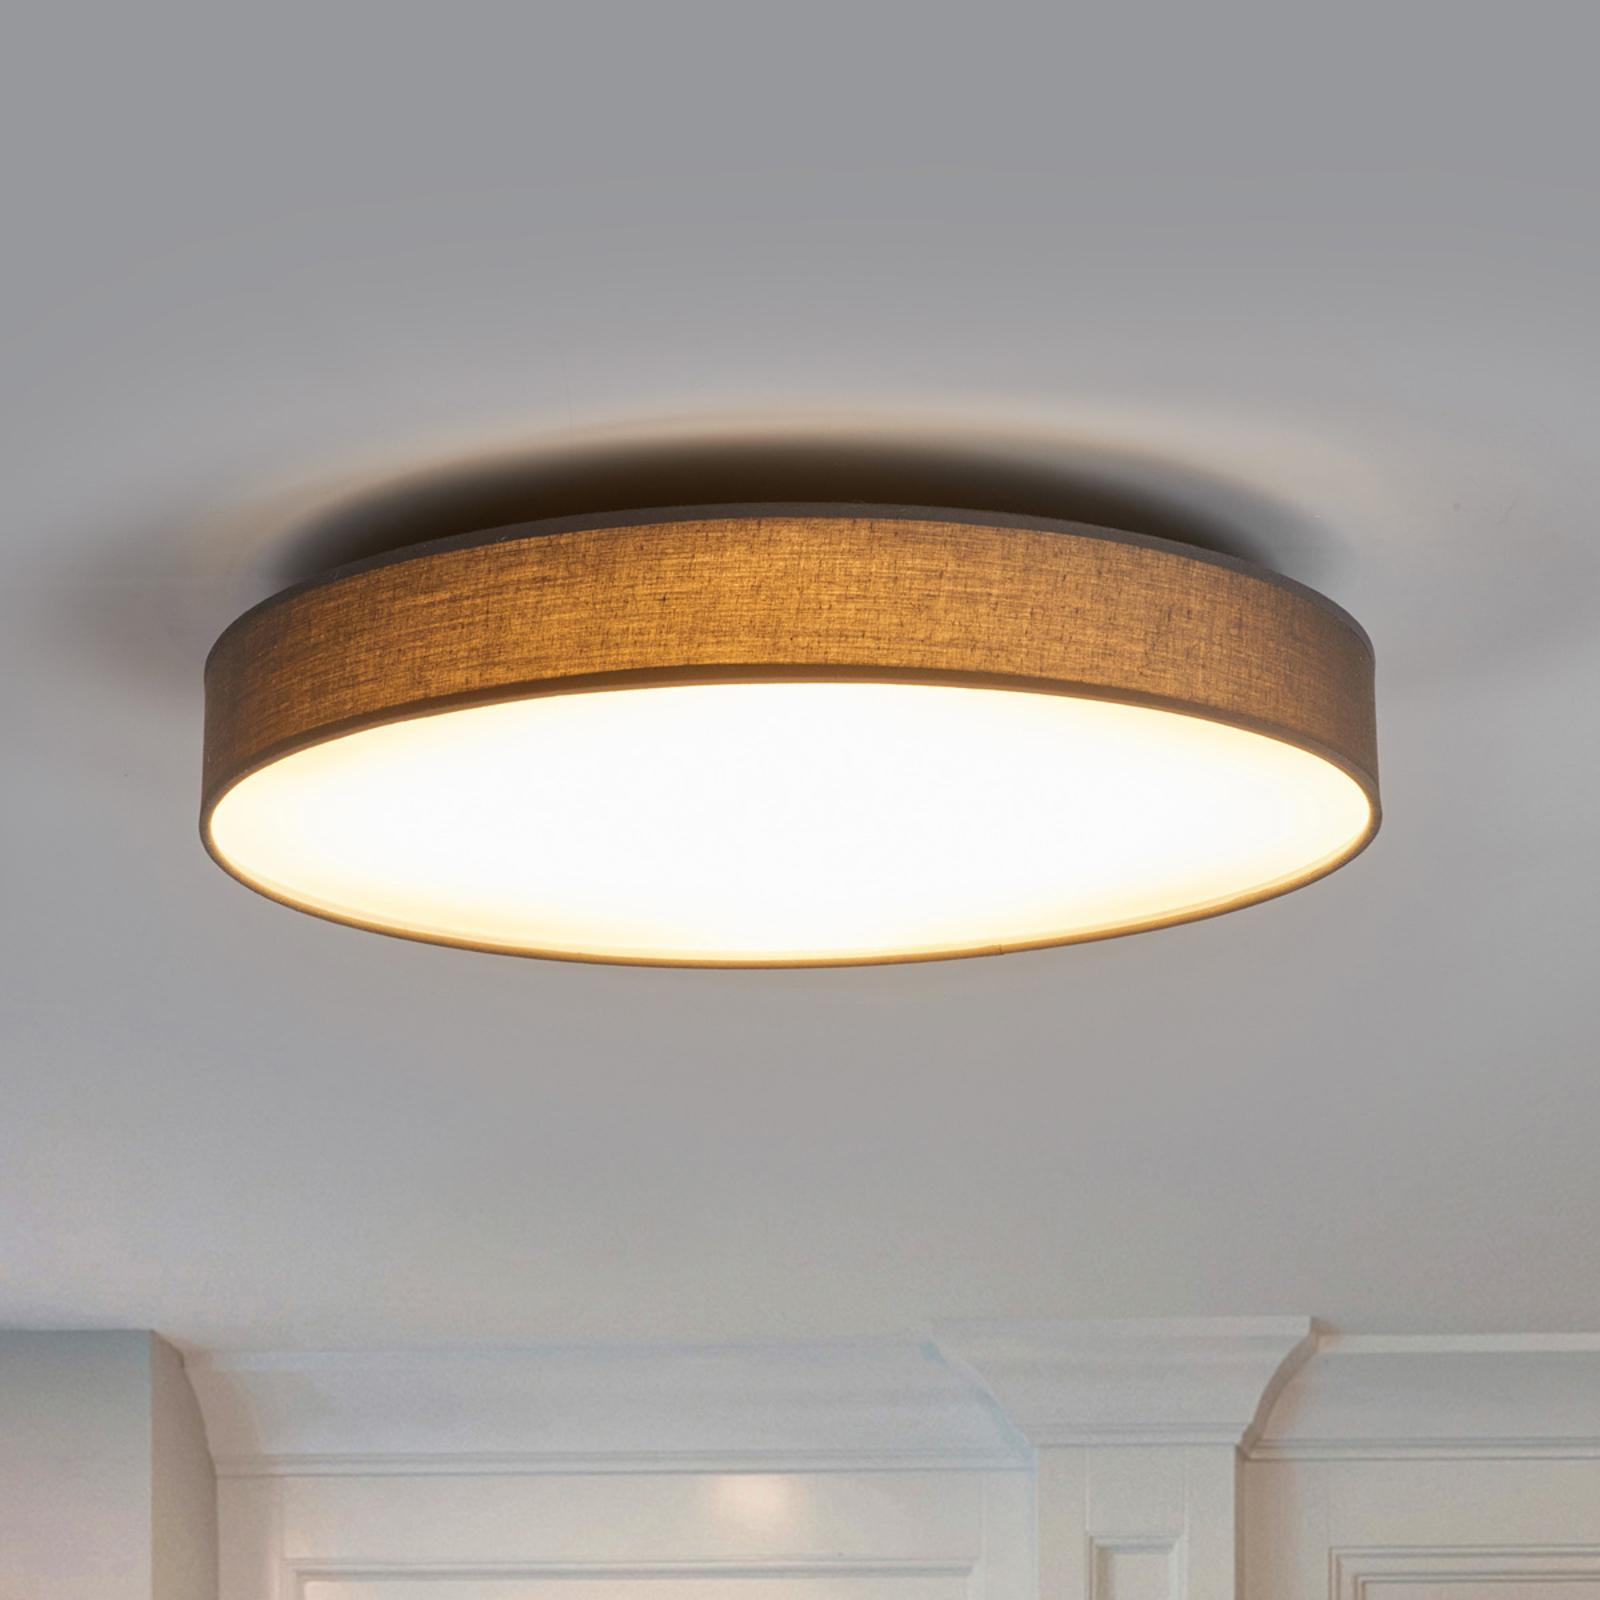 Stoffen LED-plafondlamp Saira, 50 cm, grijs